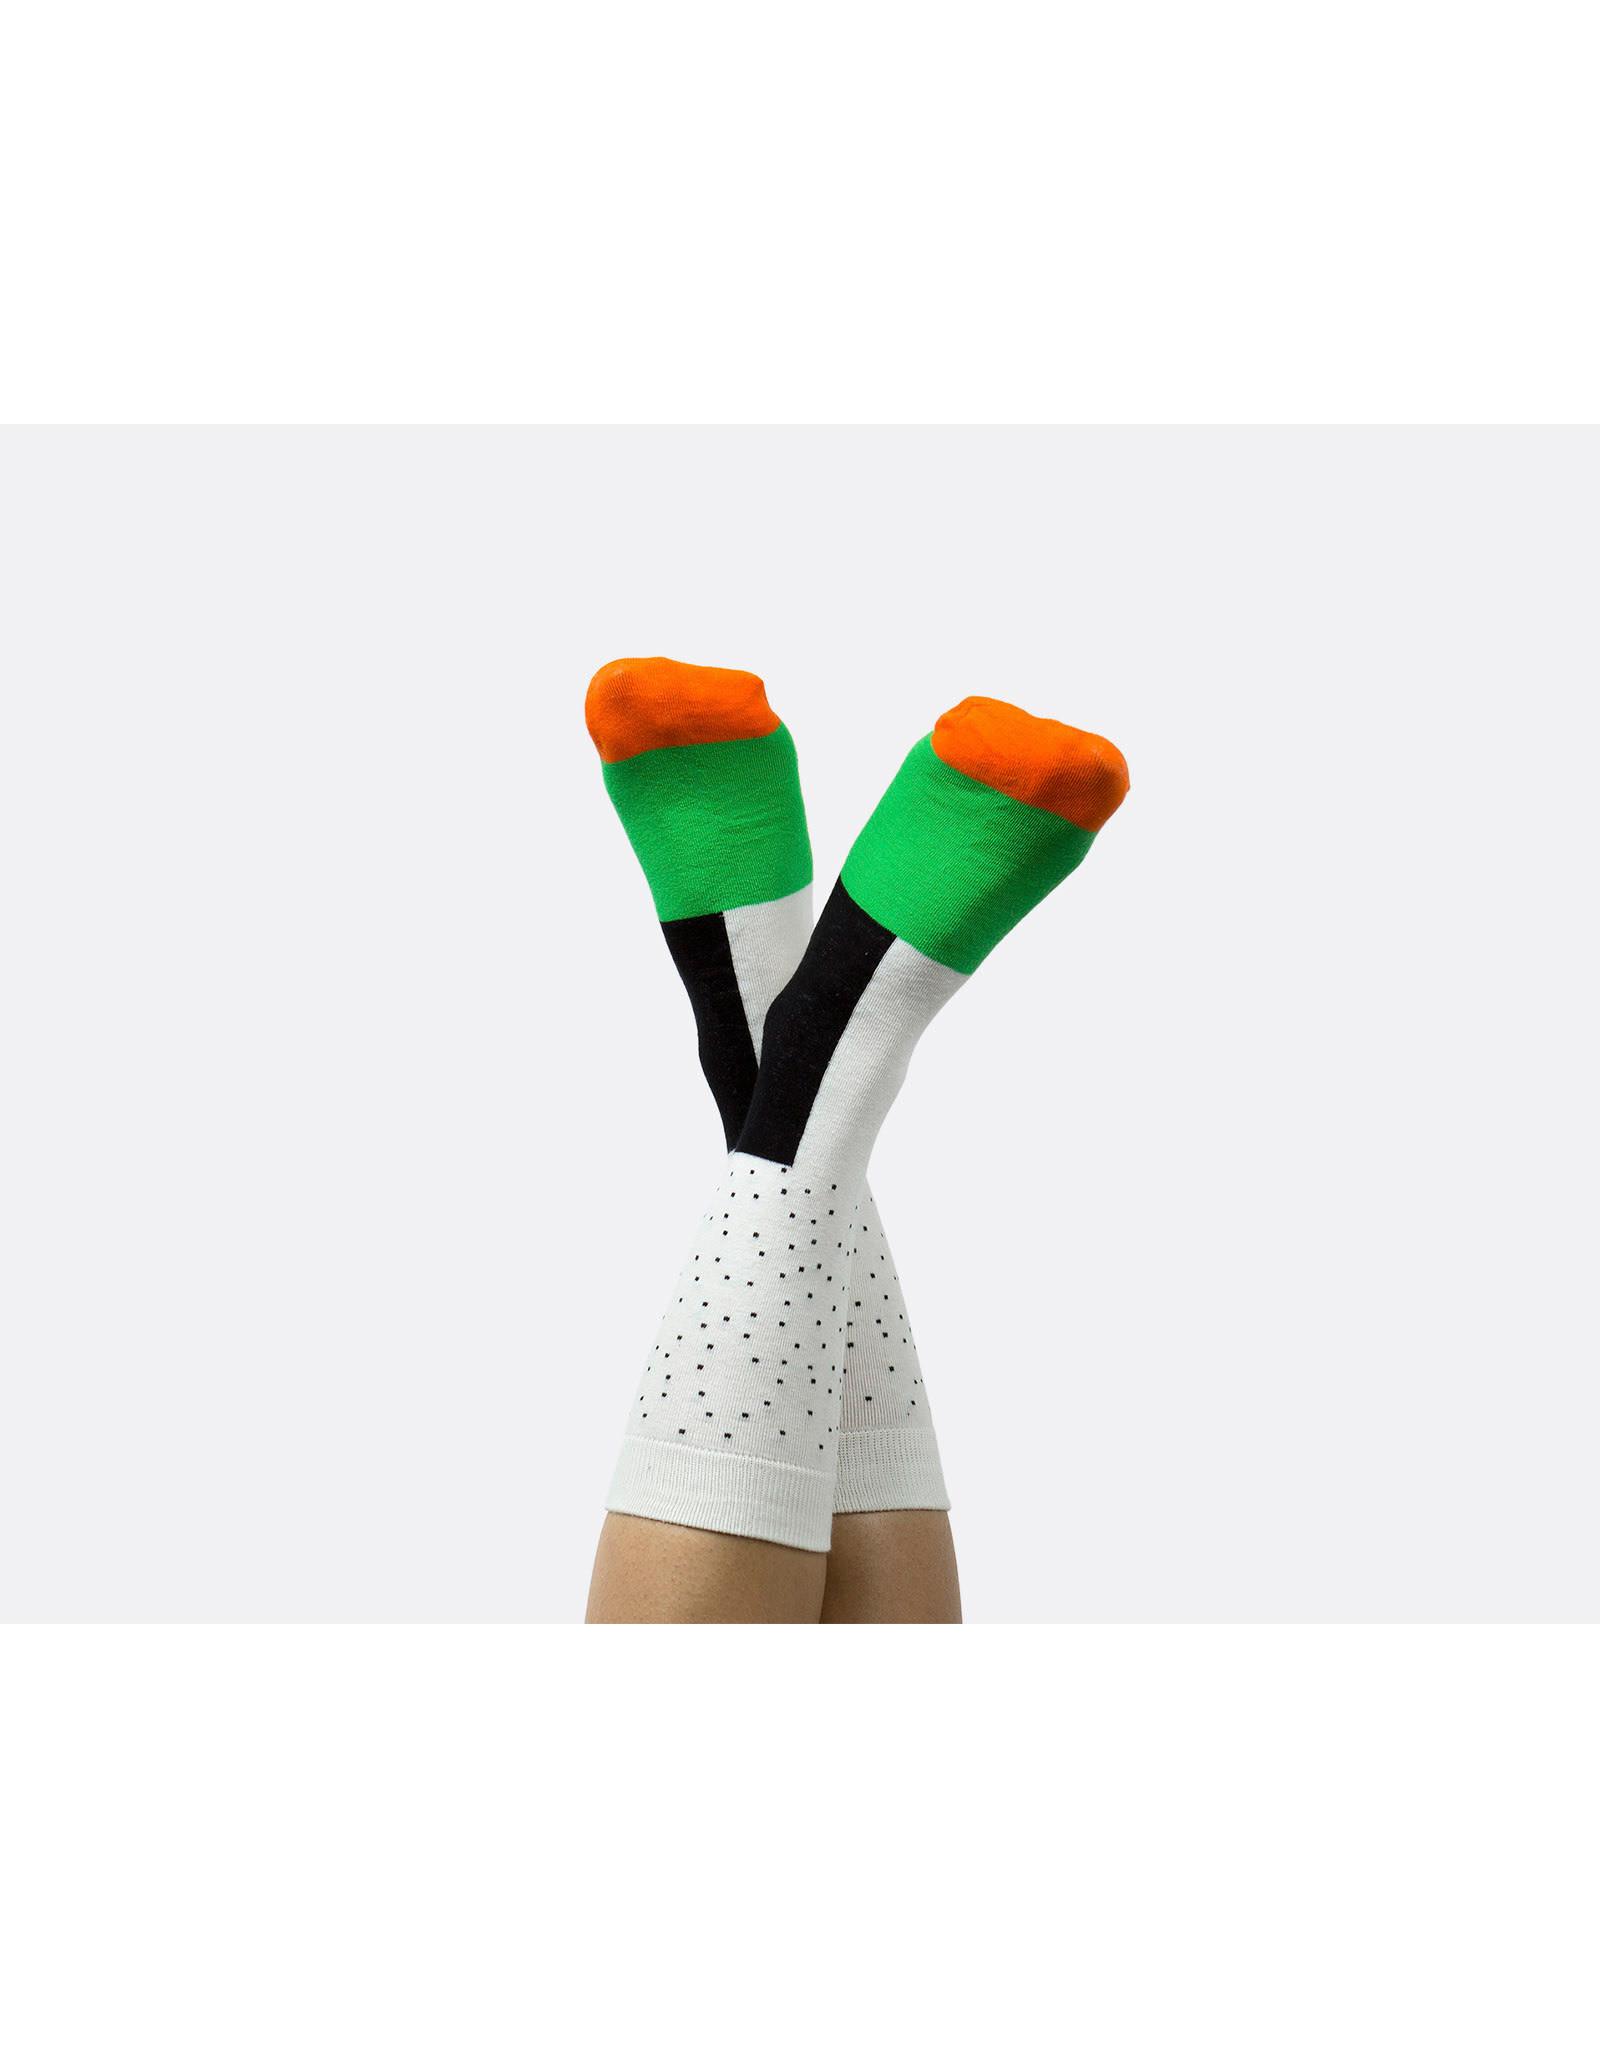 socks with sushi design